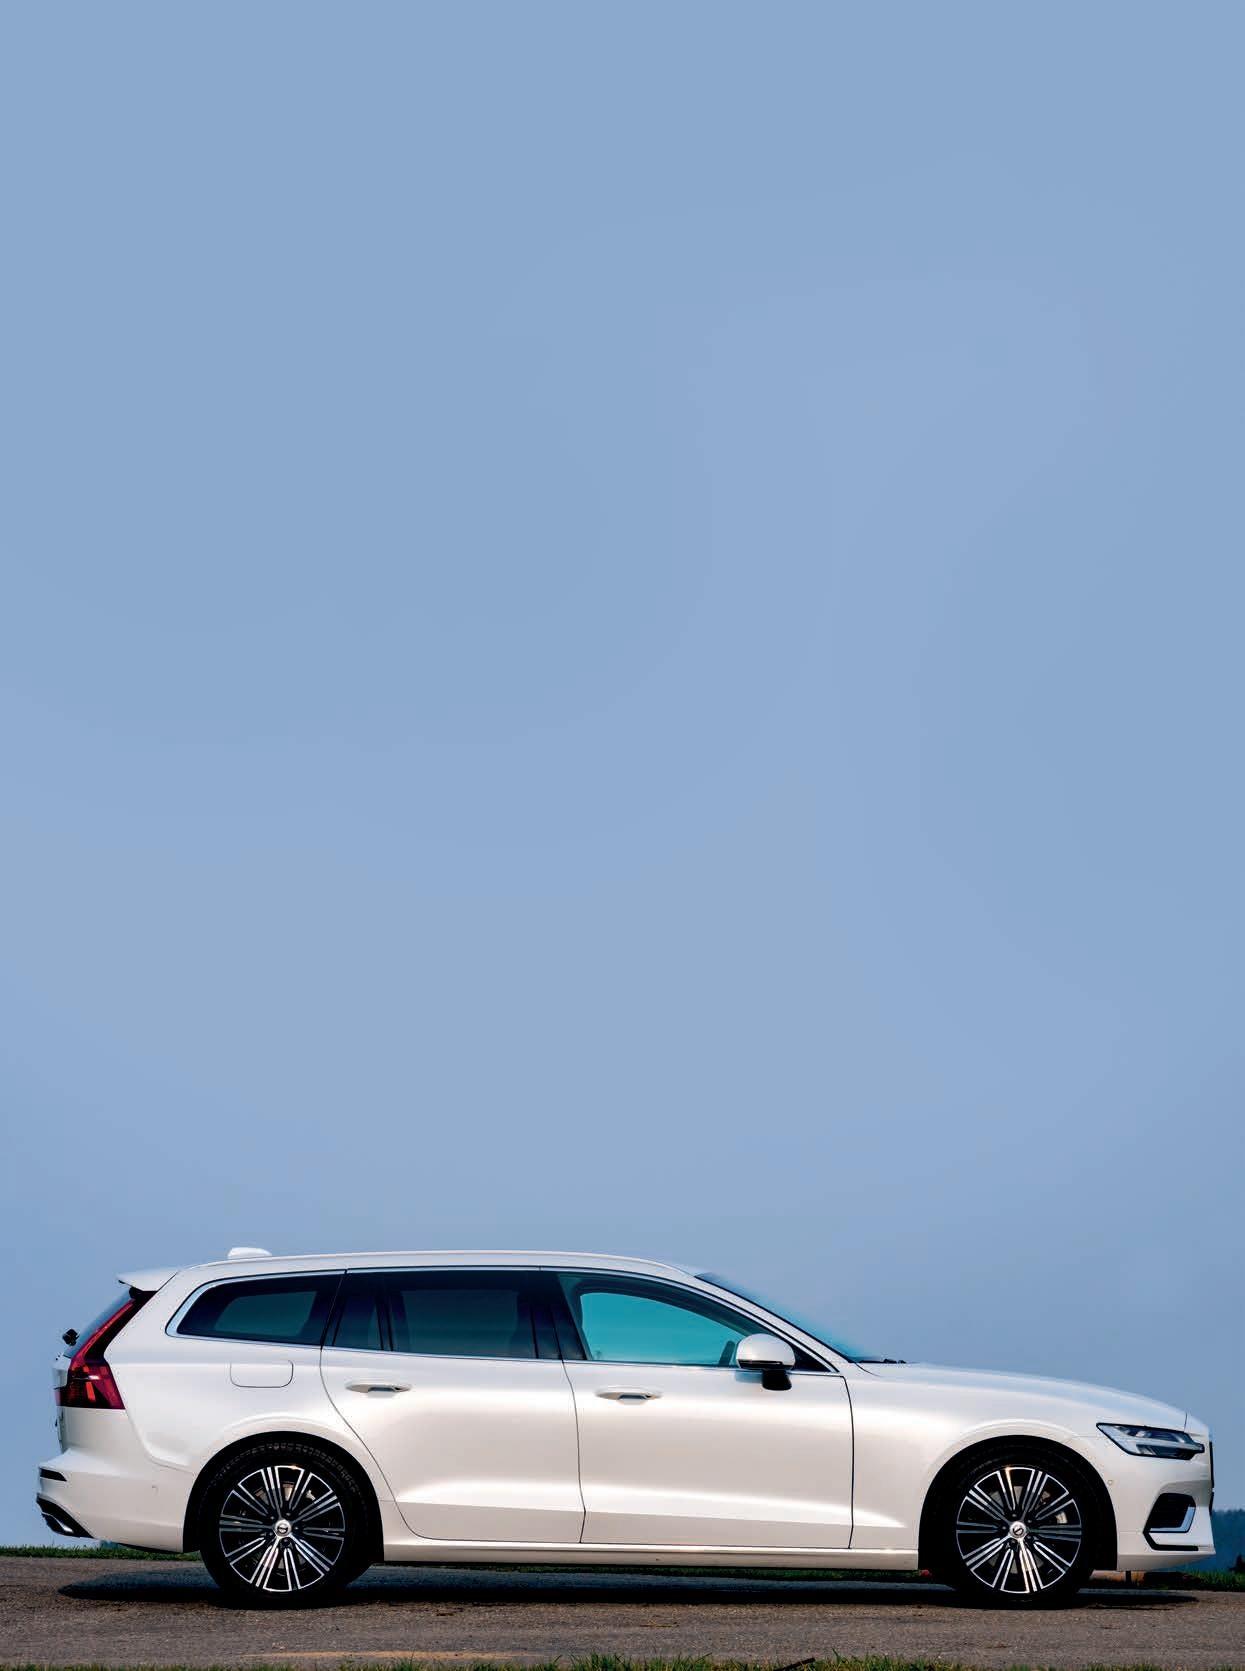 Page 44 of Fahrbericht Volvo V60 T6 eAWD Recharge: Der noble Sparfuchs aus dem hohen Norden